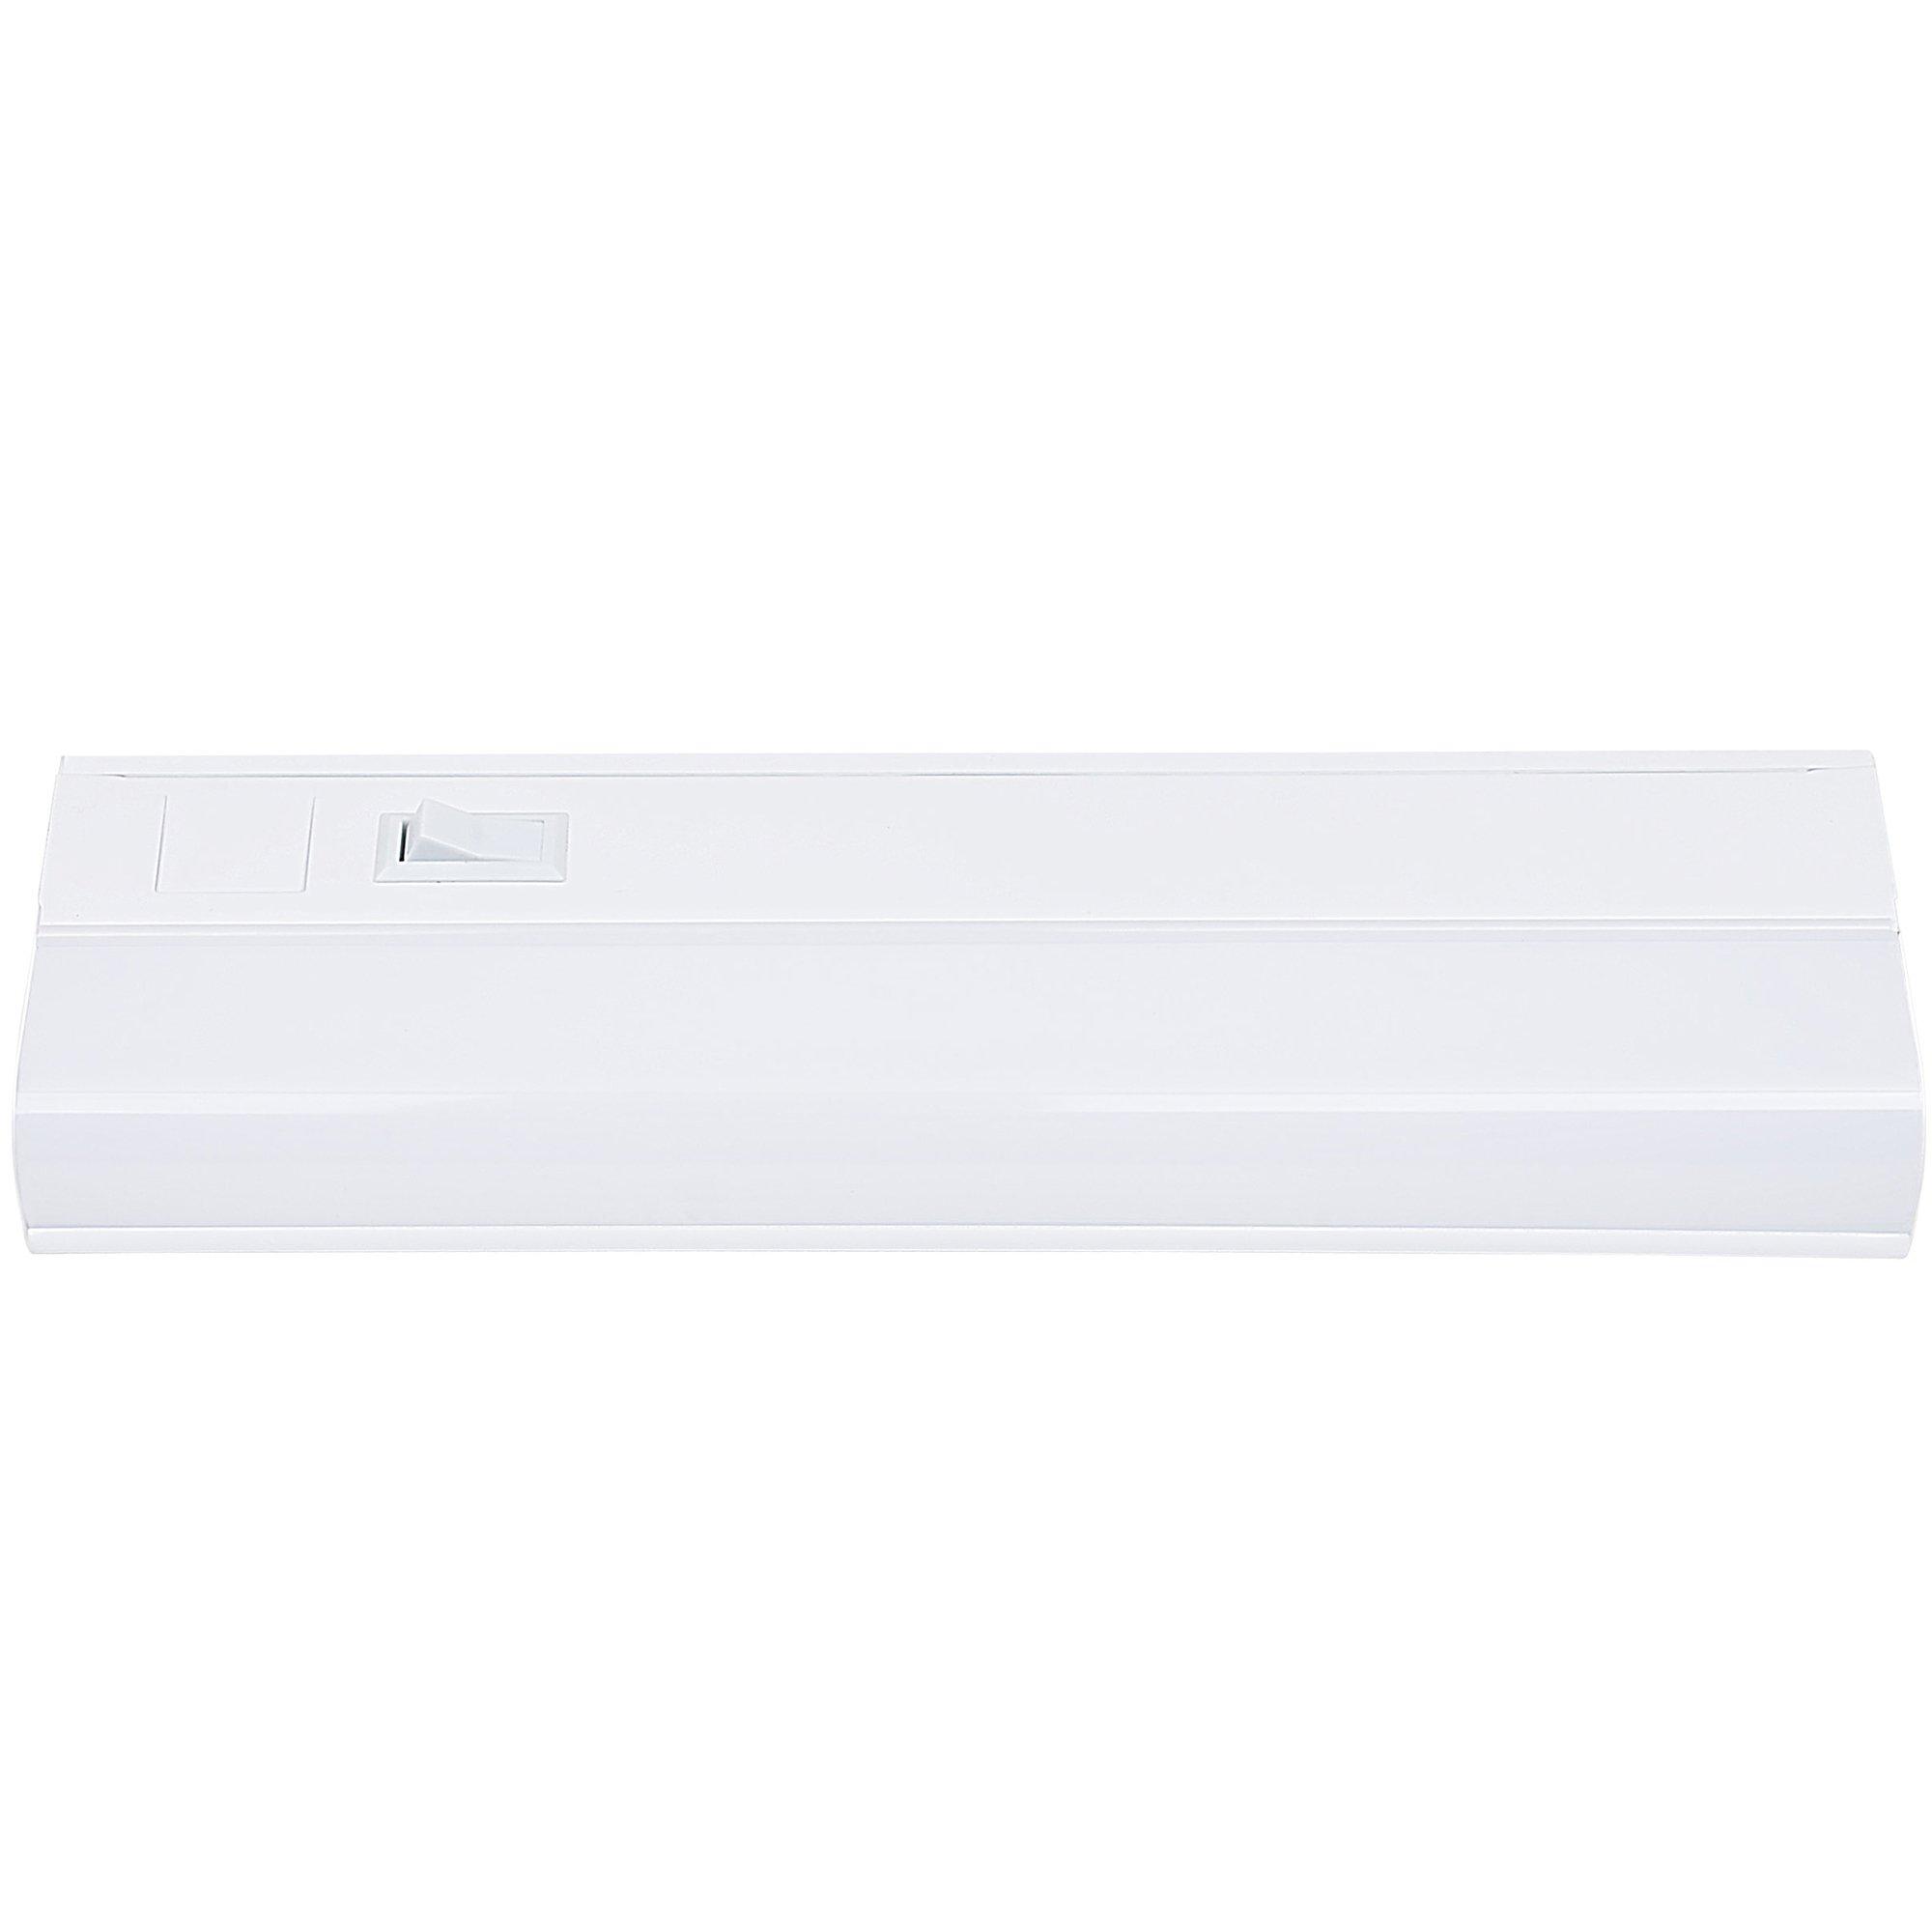 Hardwired LED Under Cabinet Lighting - 8 Watt, 12'', Dimmable, CRI>90, 3000K (Warm White), Wide Body, Long Lasting Metal Base With Frost Lens by HARRRRD